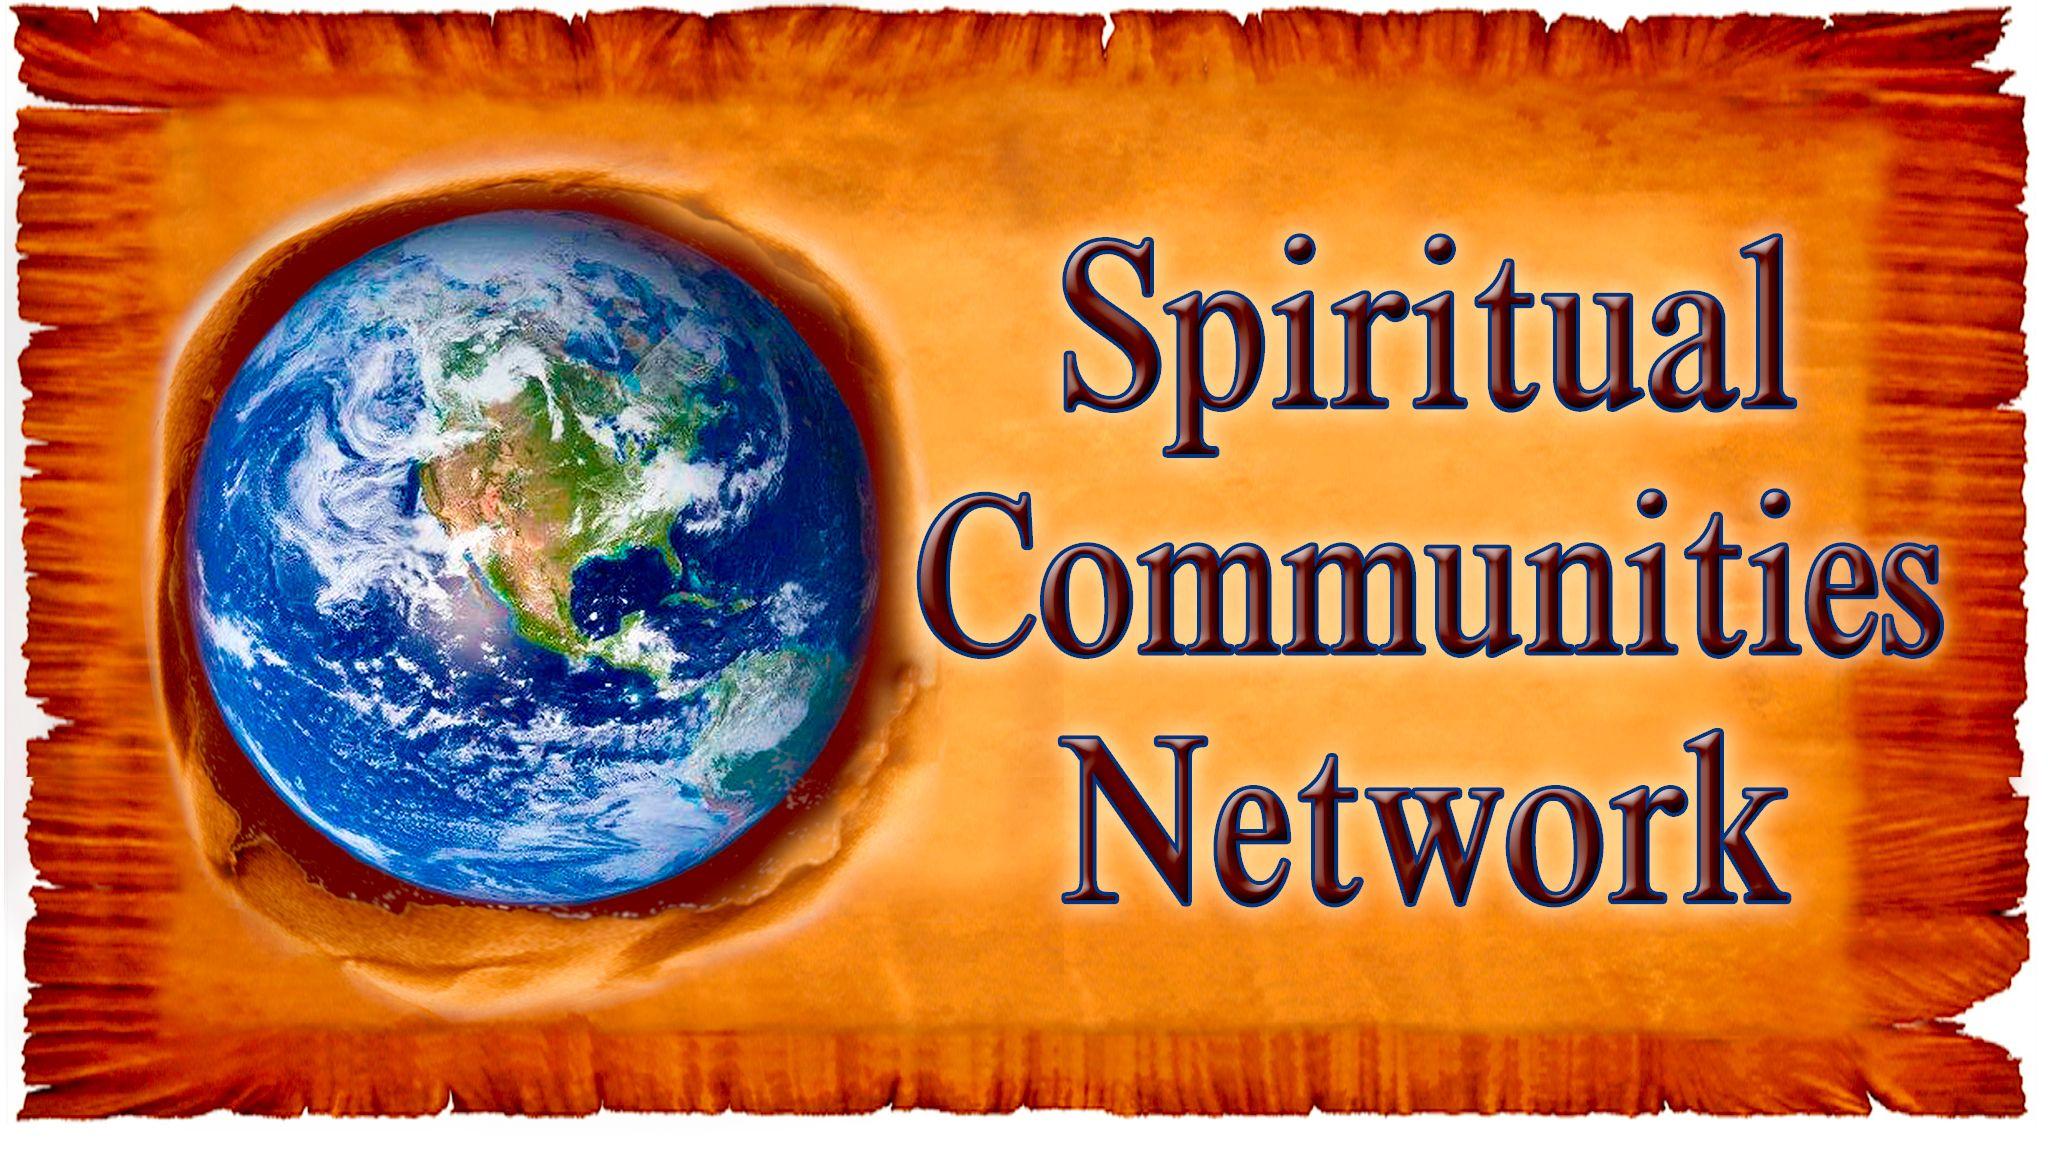 Spiritual Community of Tampa/St. Petersburg